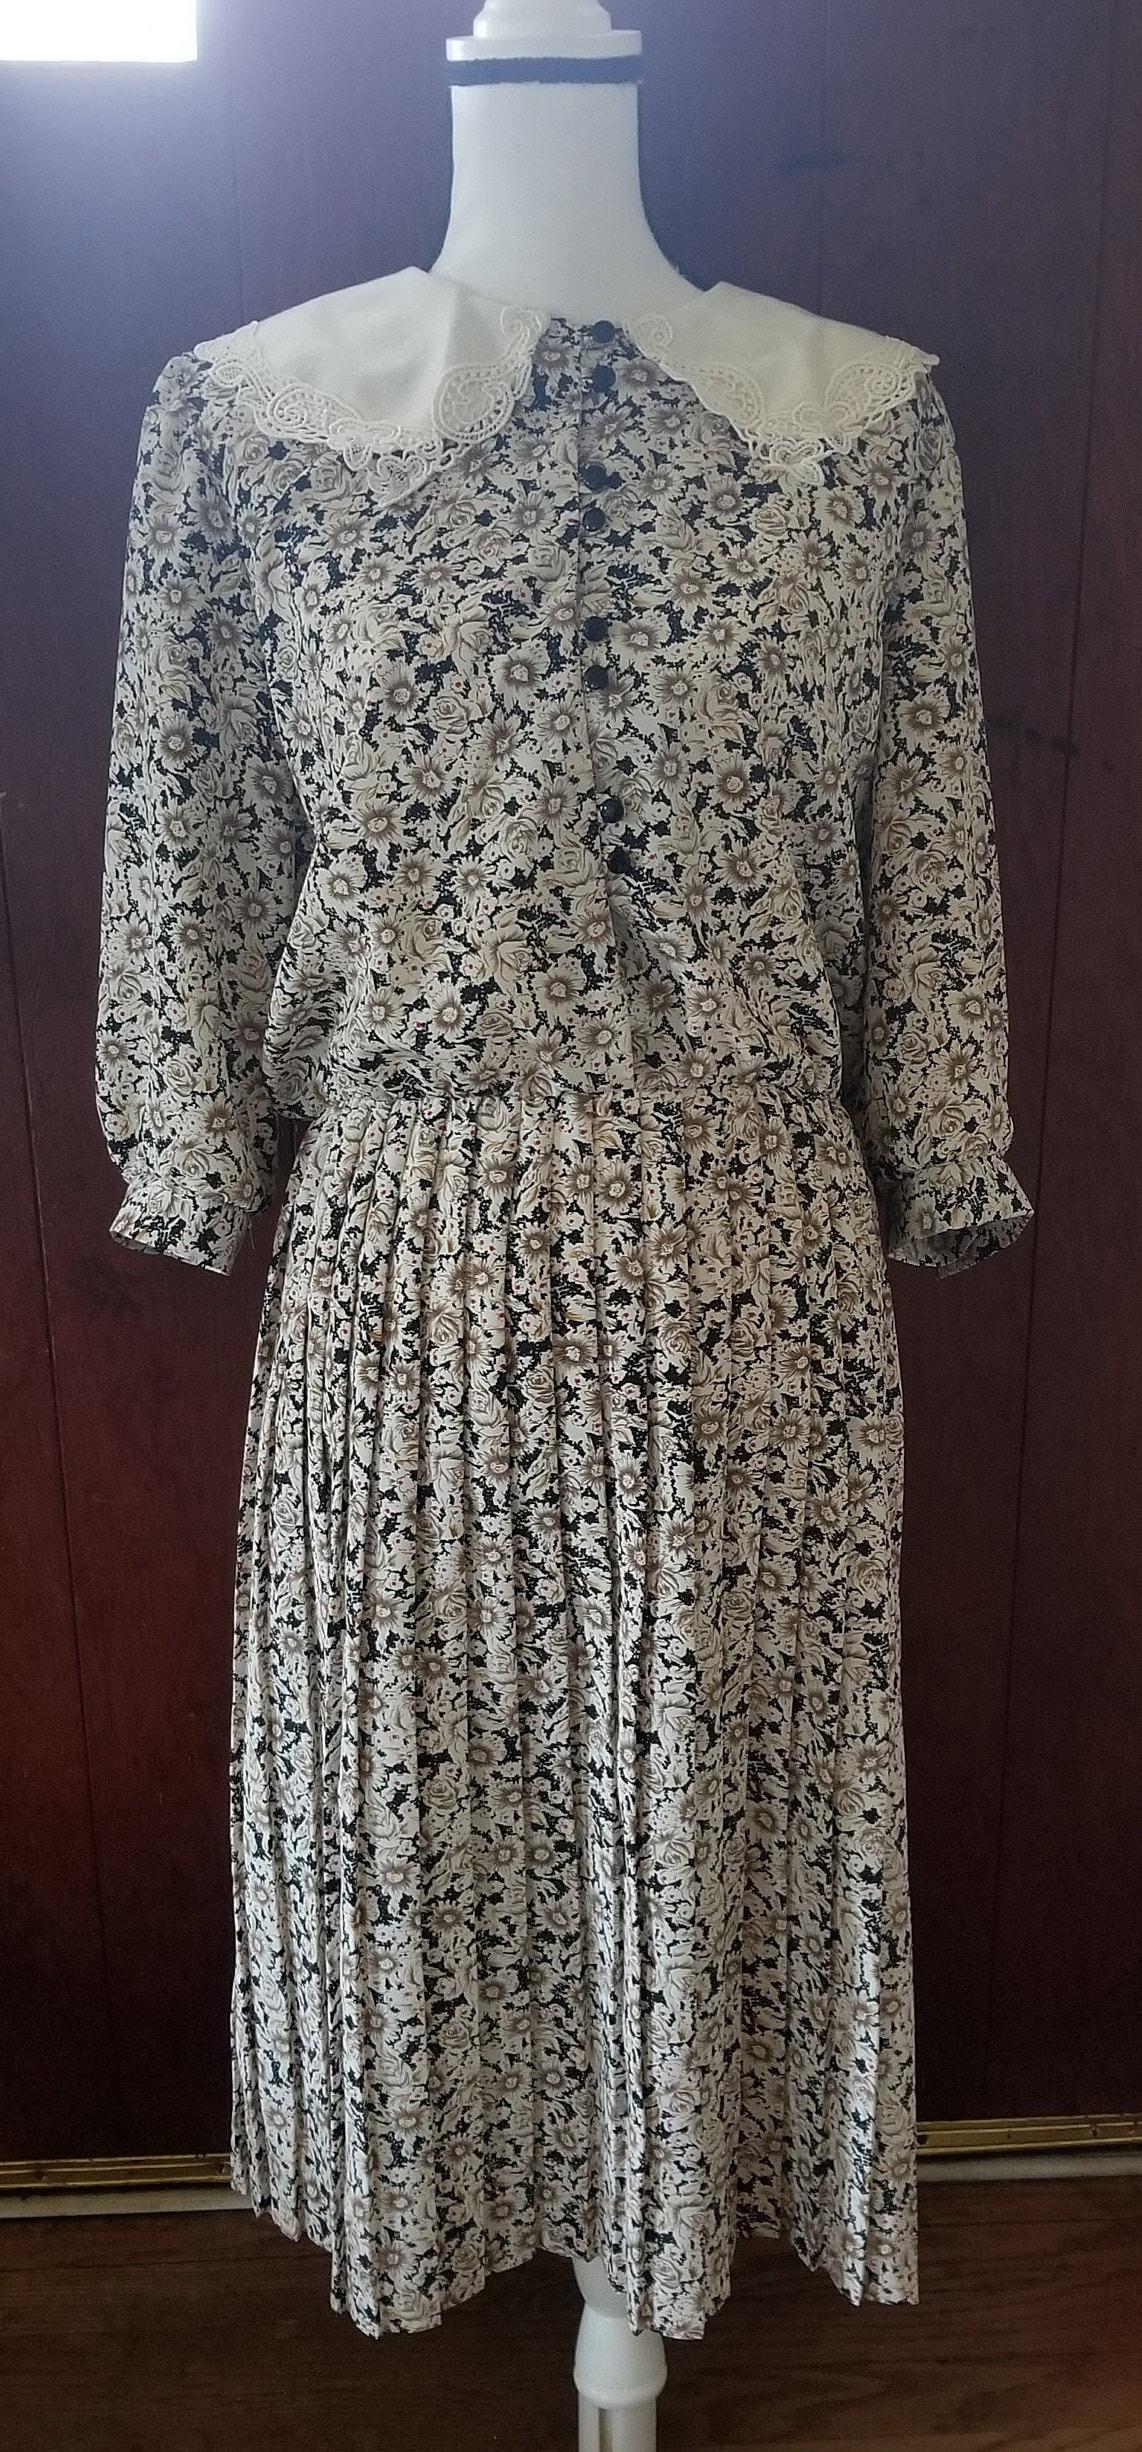 8853e94ddd Vintage Breli Originals Dress 12 Floral Peter Pan Collar